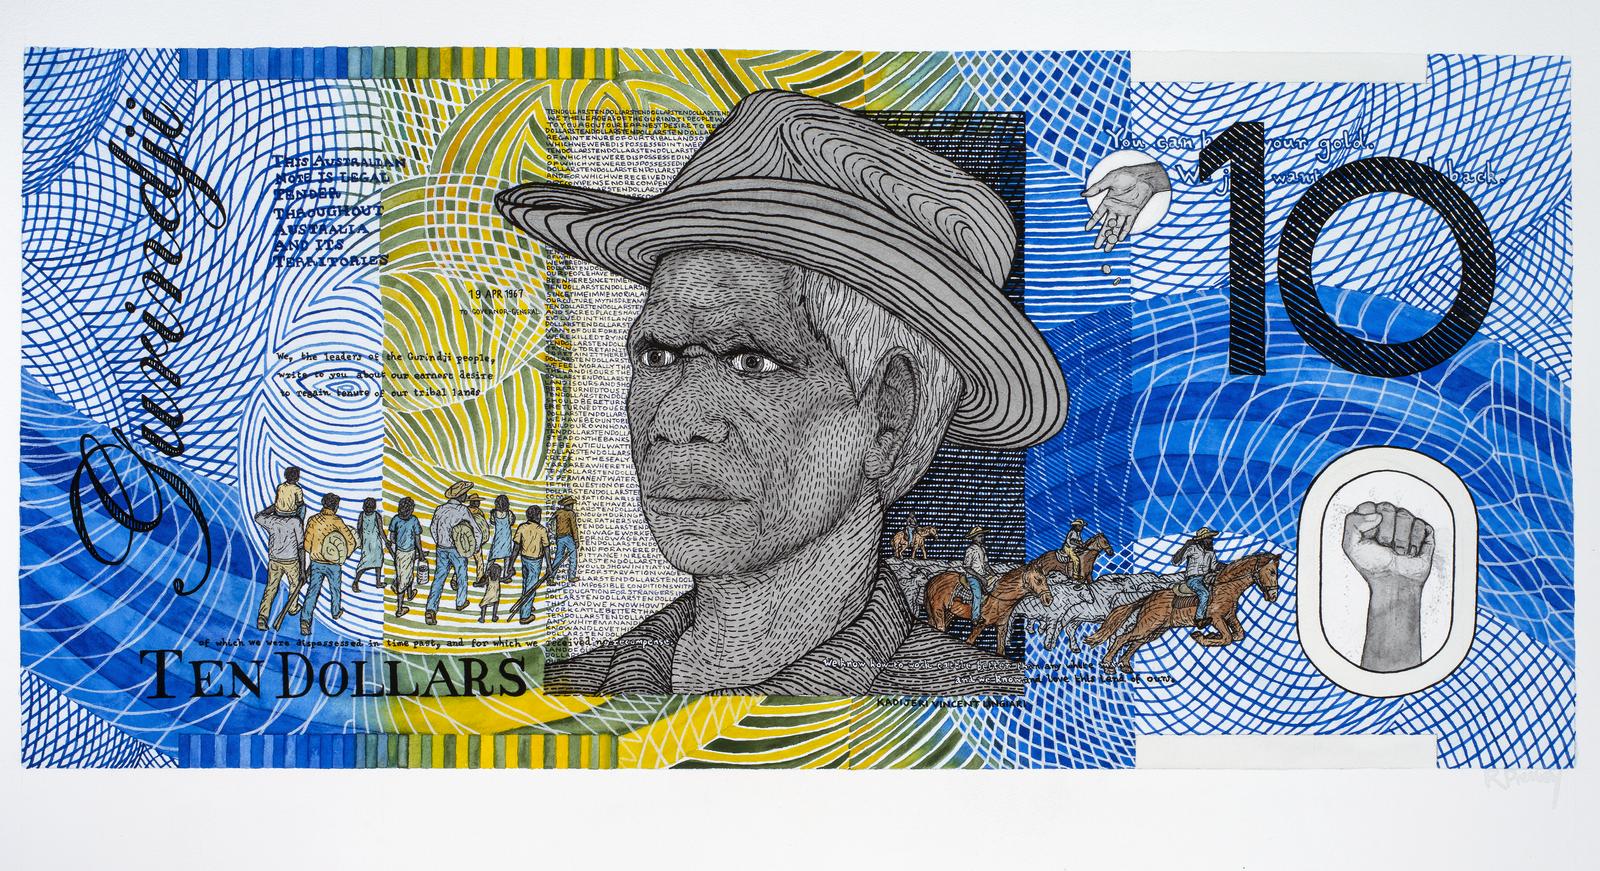 Vincent Lingiari am (1919-1988) Blood Money – Ten Dollar Note – Vincent Lingiari Commemorative 2011